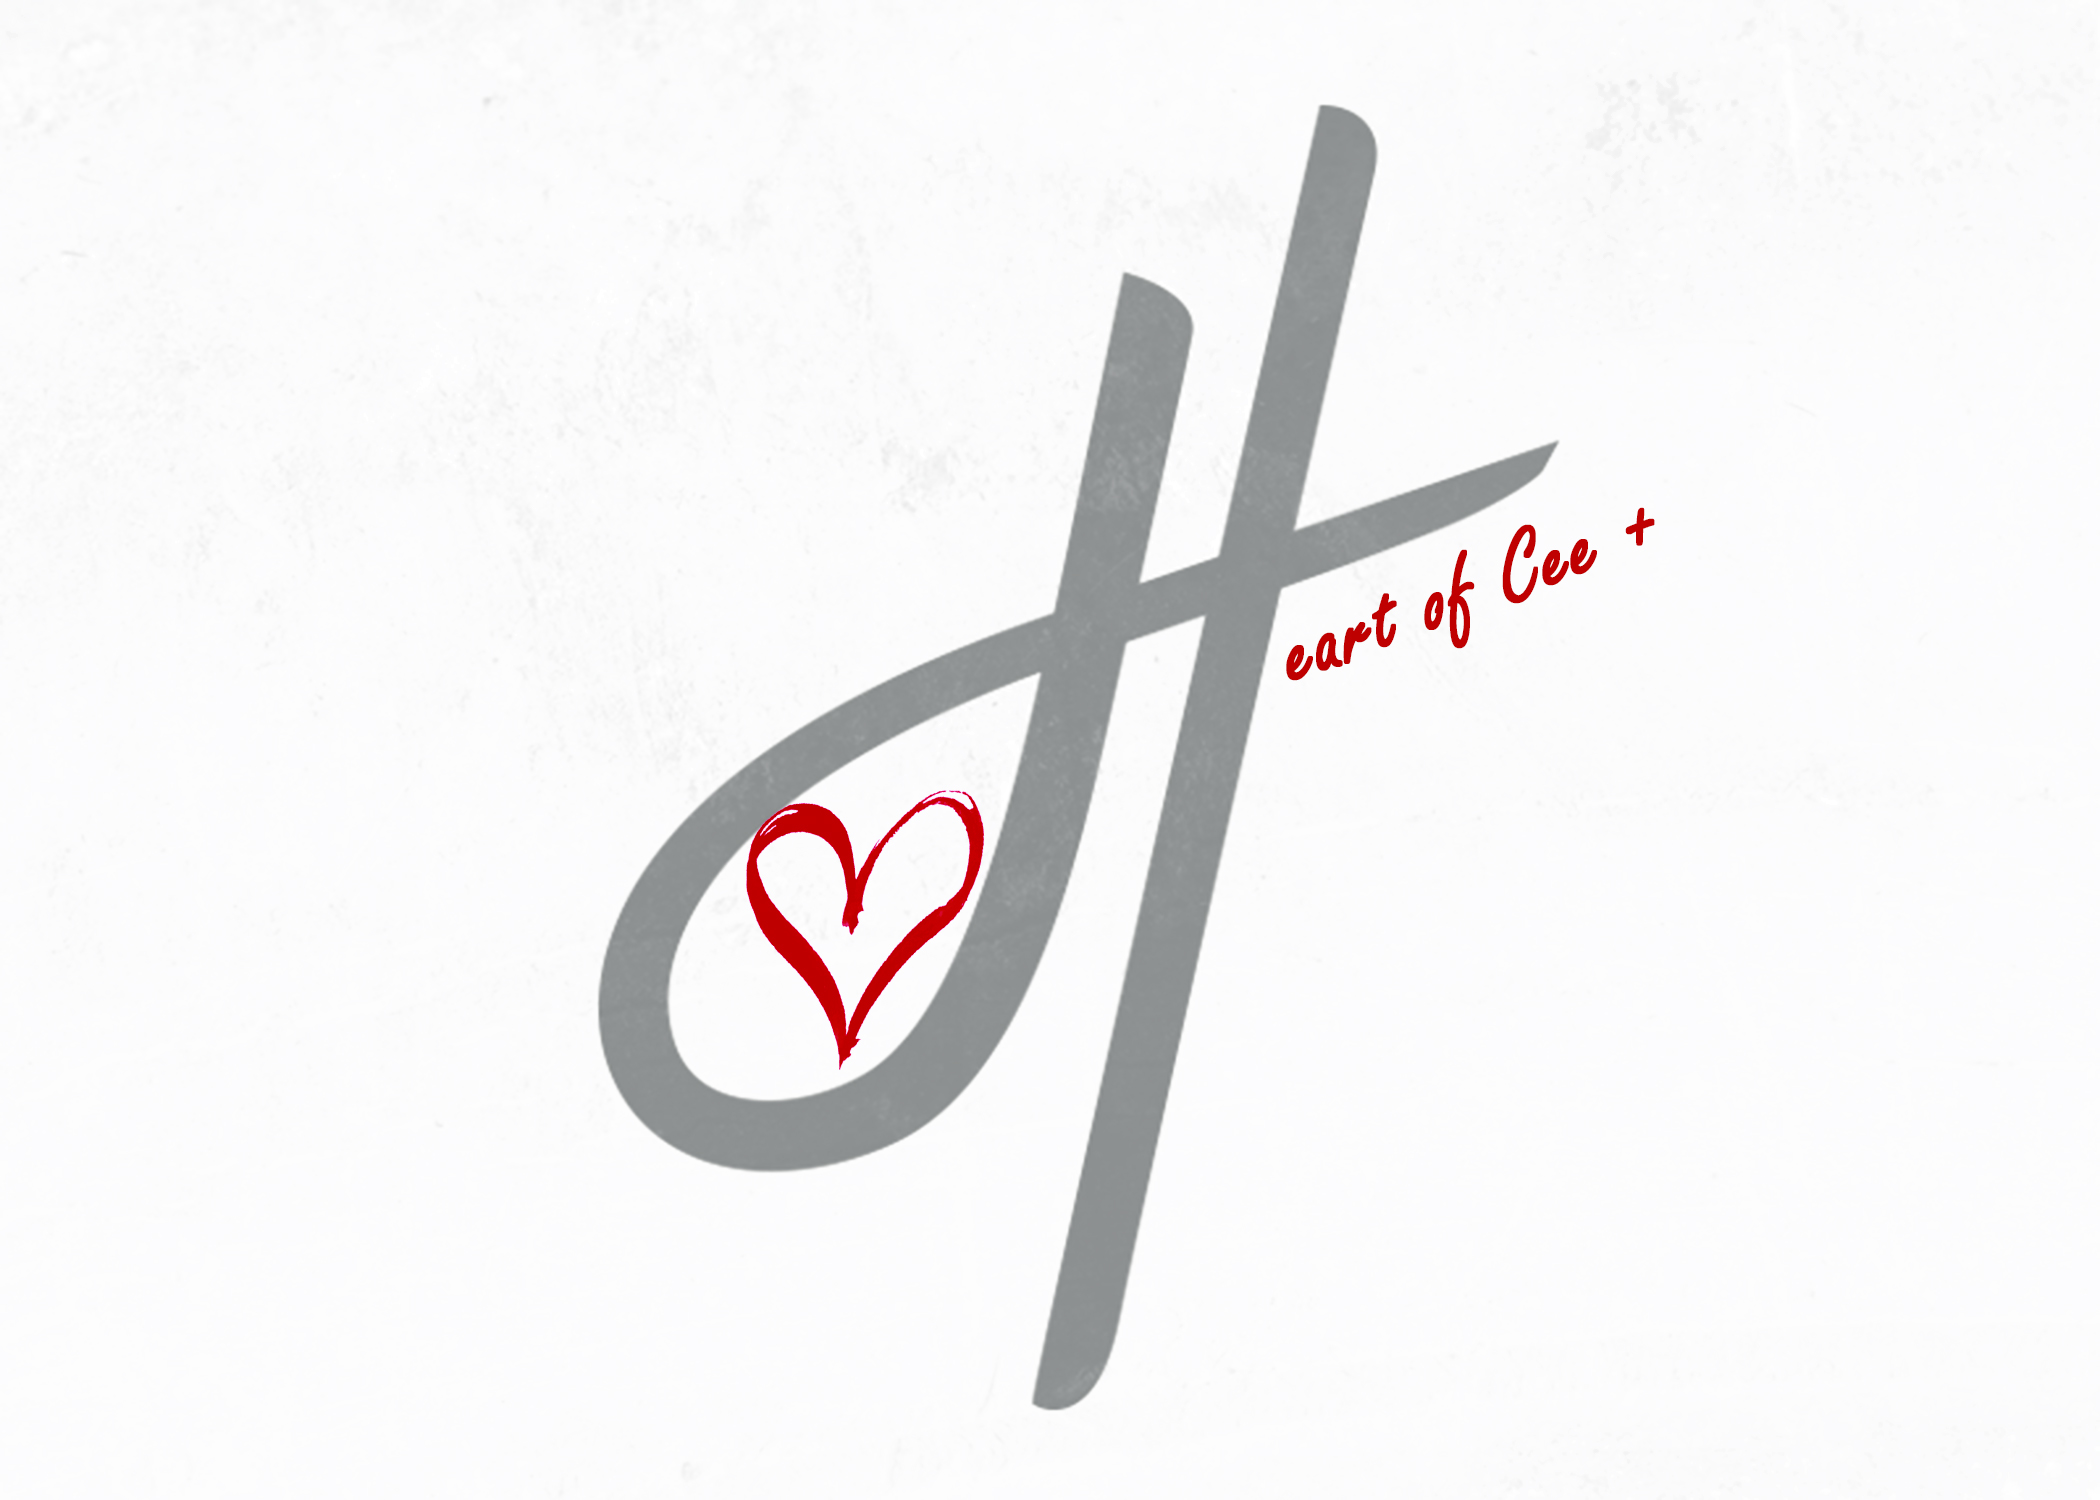 Heart of Cee LogoP.jpg